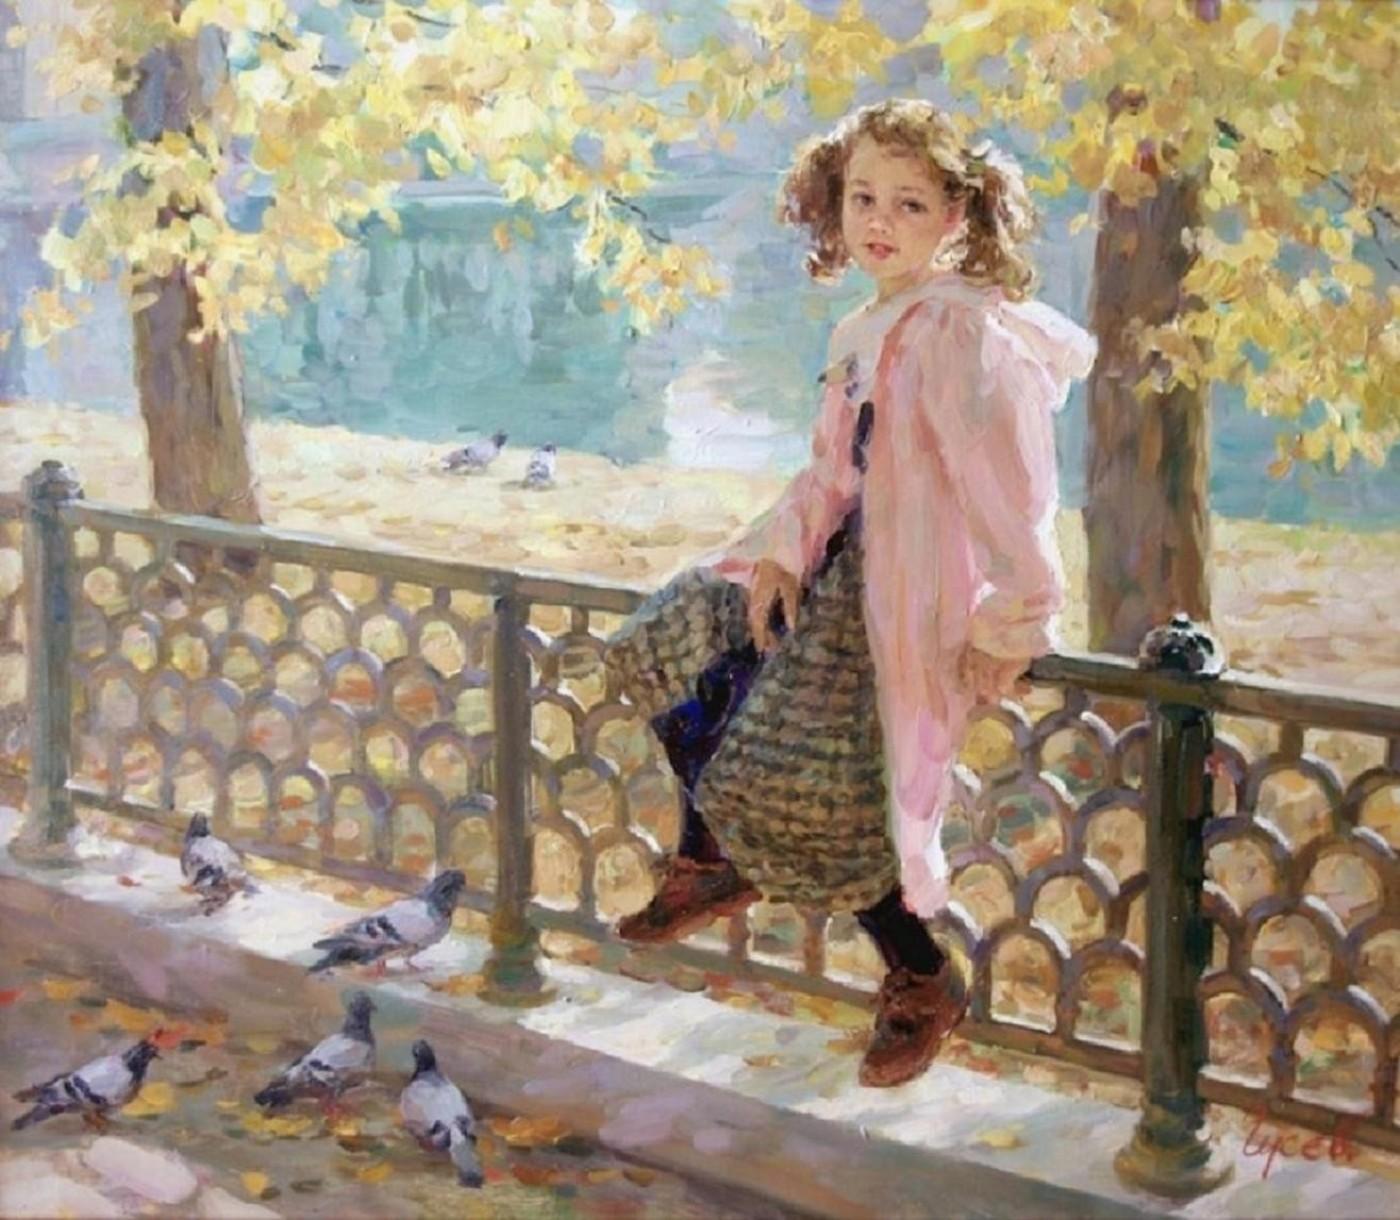 Vladimir Gusev Vladimir-gusev-b-1957-on-patriarchal-pond-no-date-e1262149163872